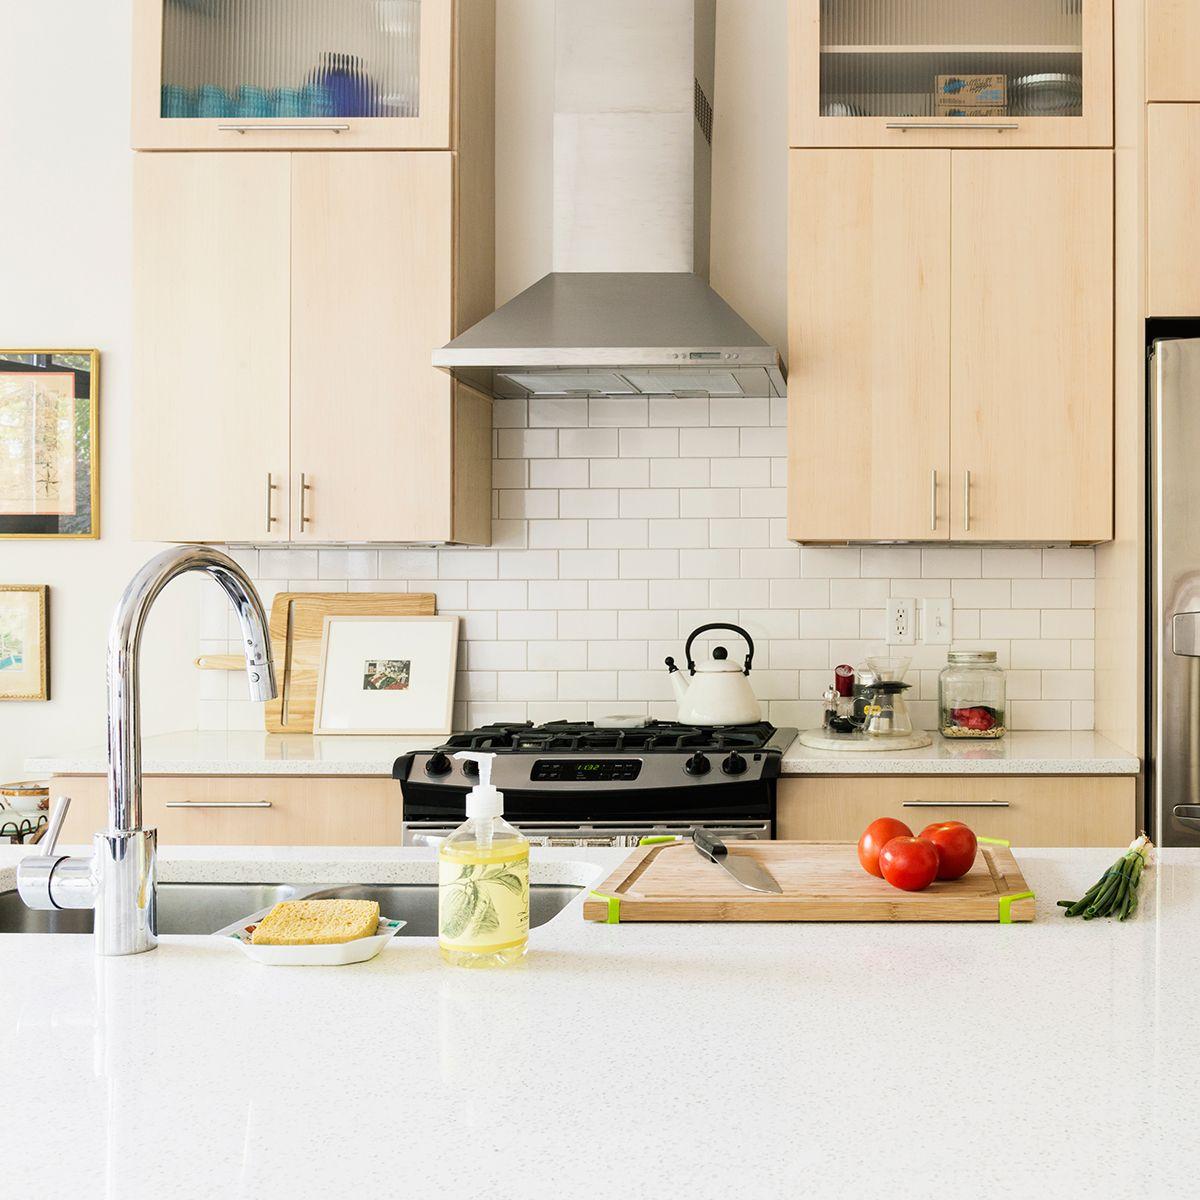 Worktop Cleaning Tips Kitchen Cleaning Action Plan Worktops